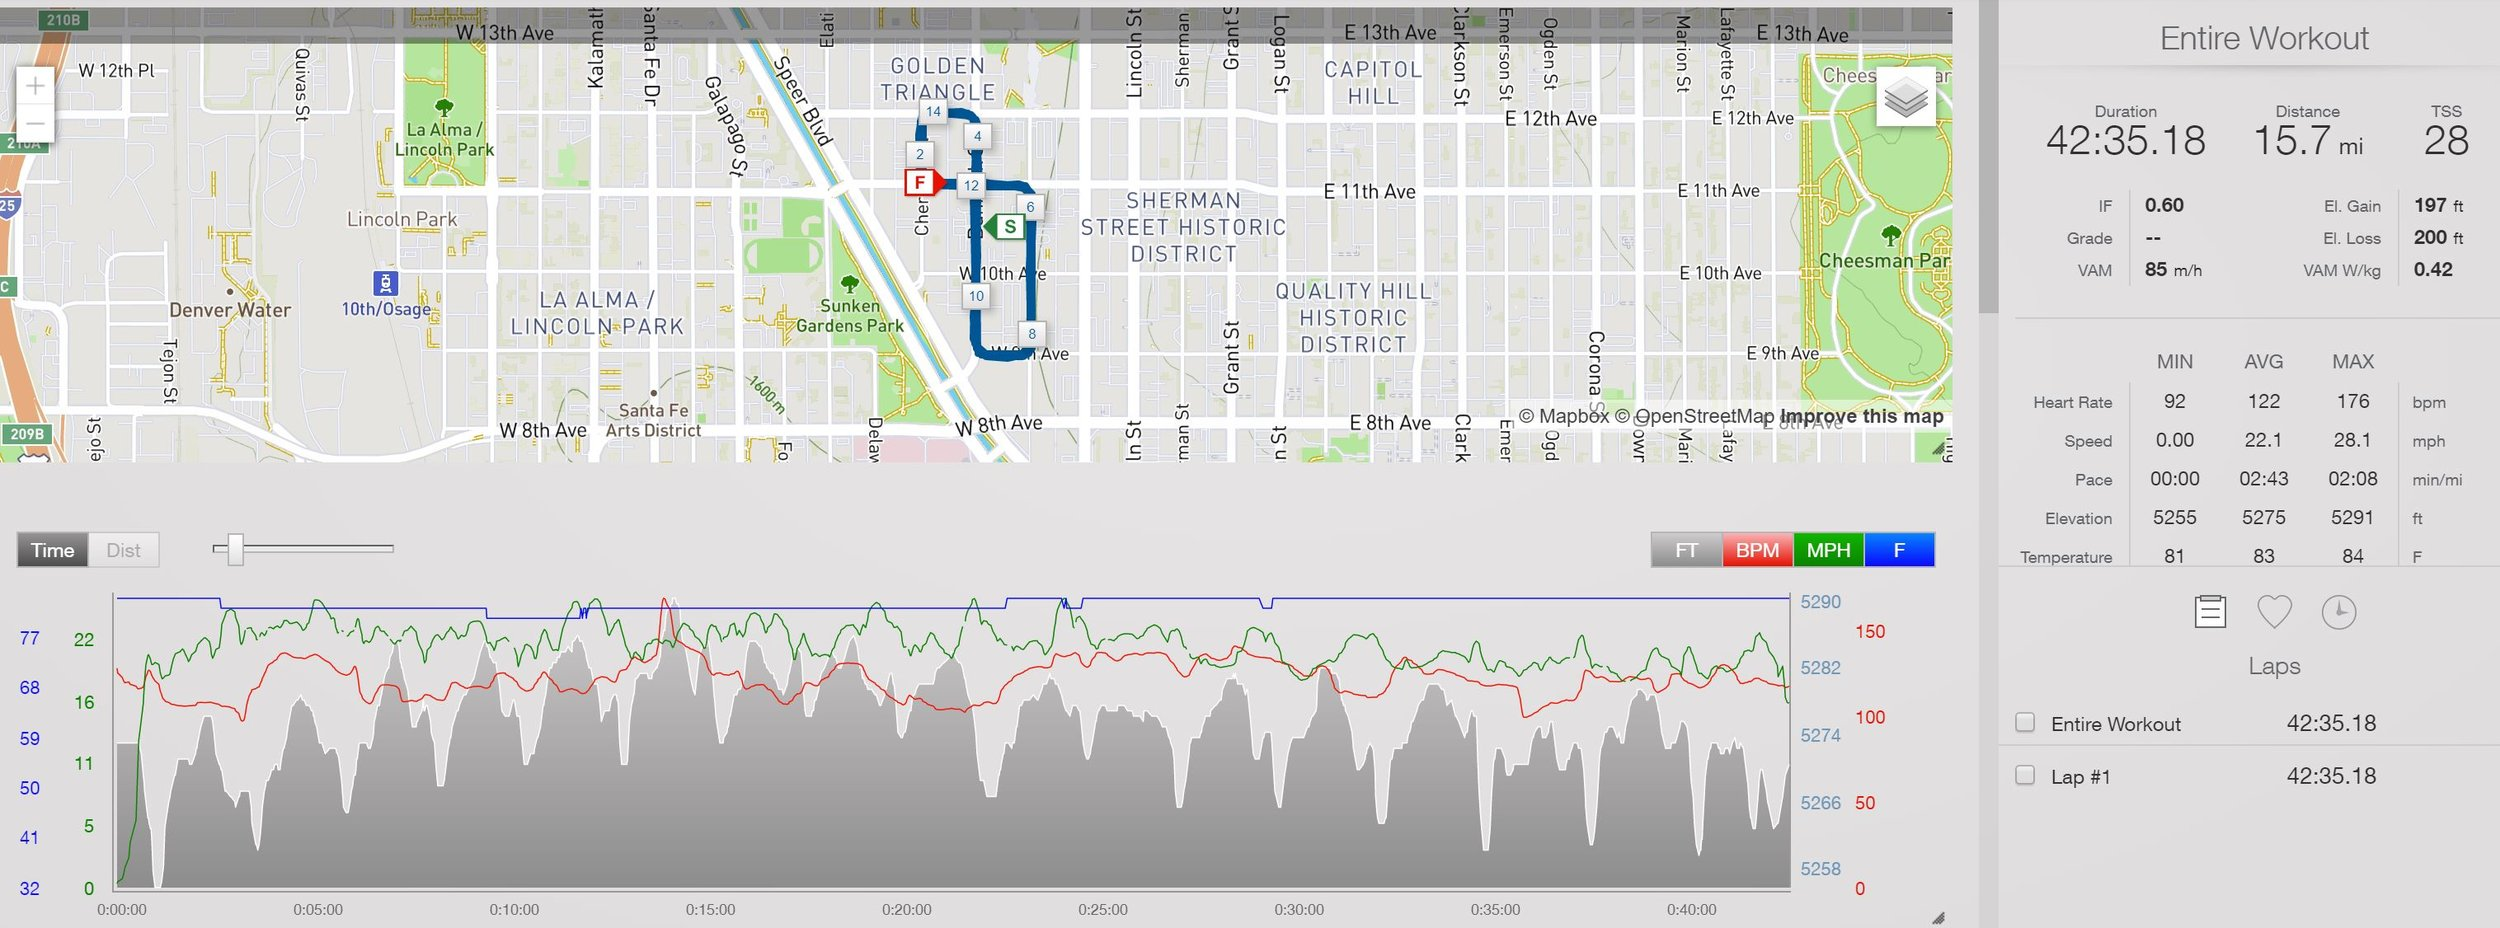 Data analysis for the Bannock Street Criterium (no power data)